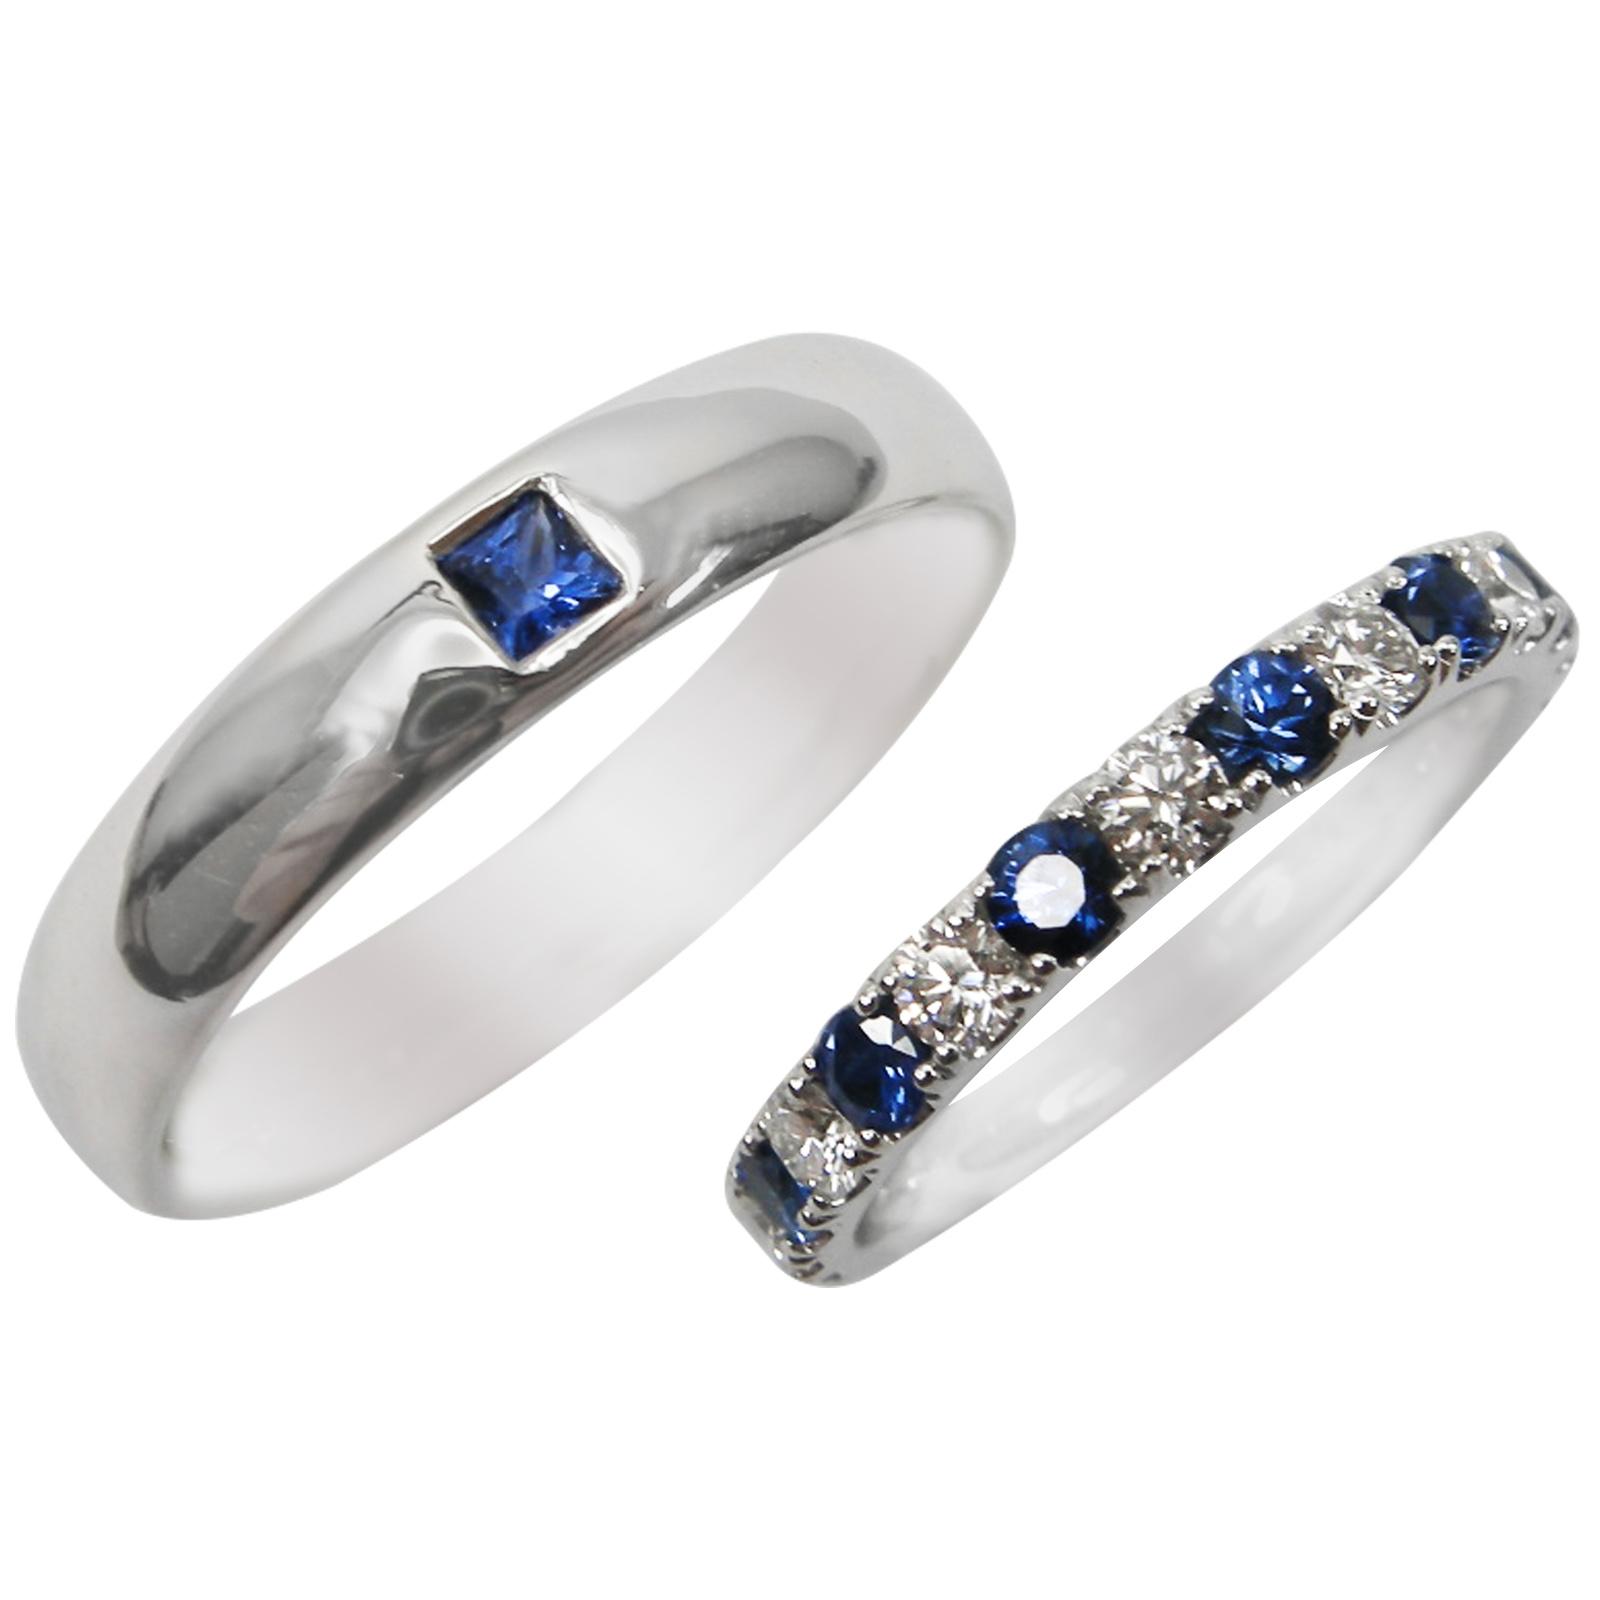 BLUE SAPPHIRE AND DIAMOND WEDDING BAND SET BESPOKE FINE JEWELLERY BY SHAHINA HATTA